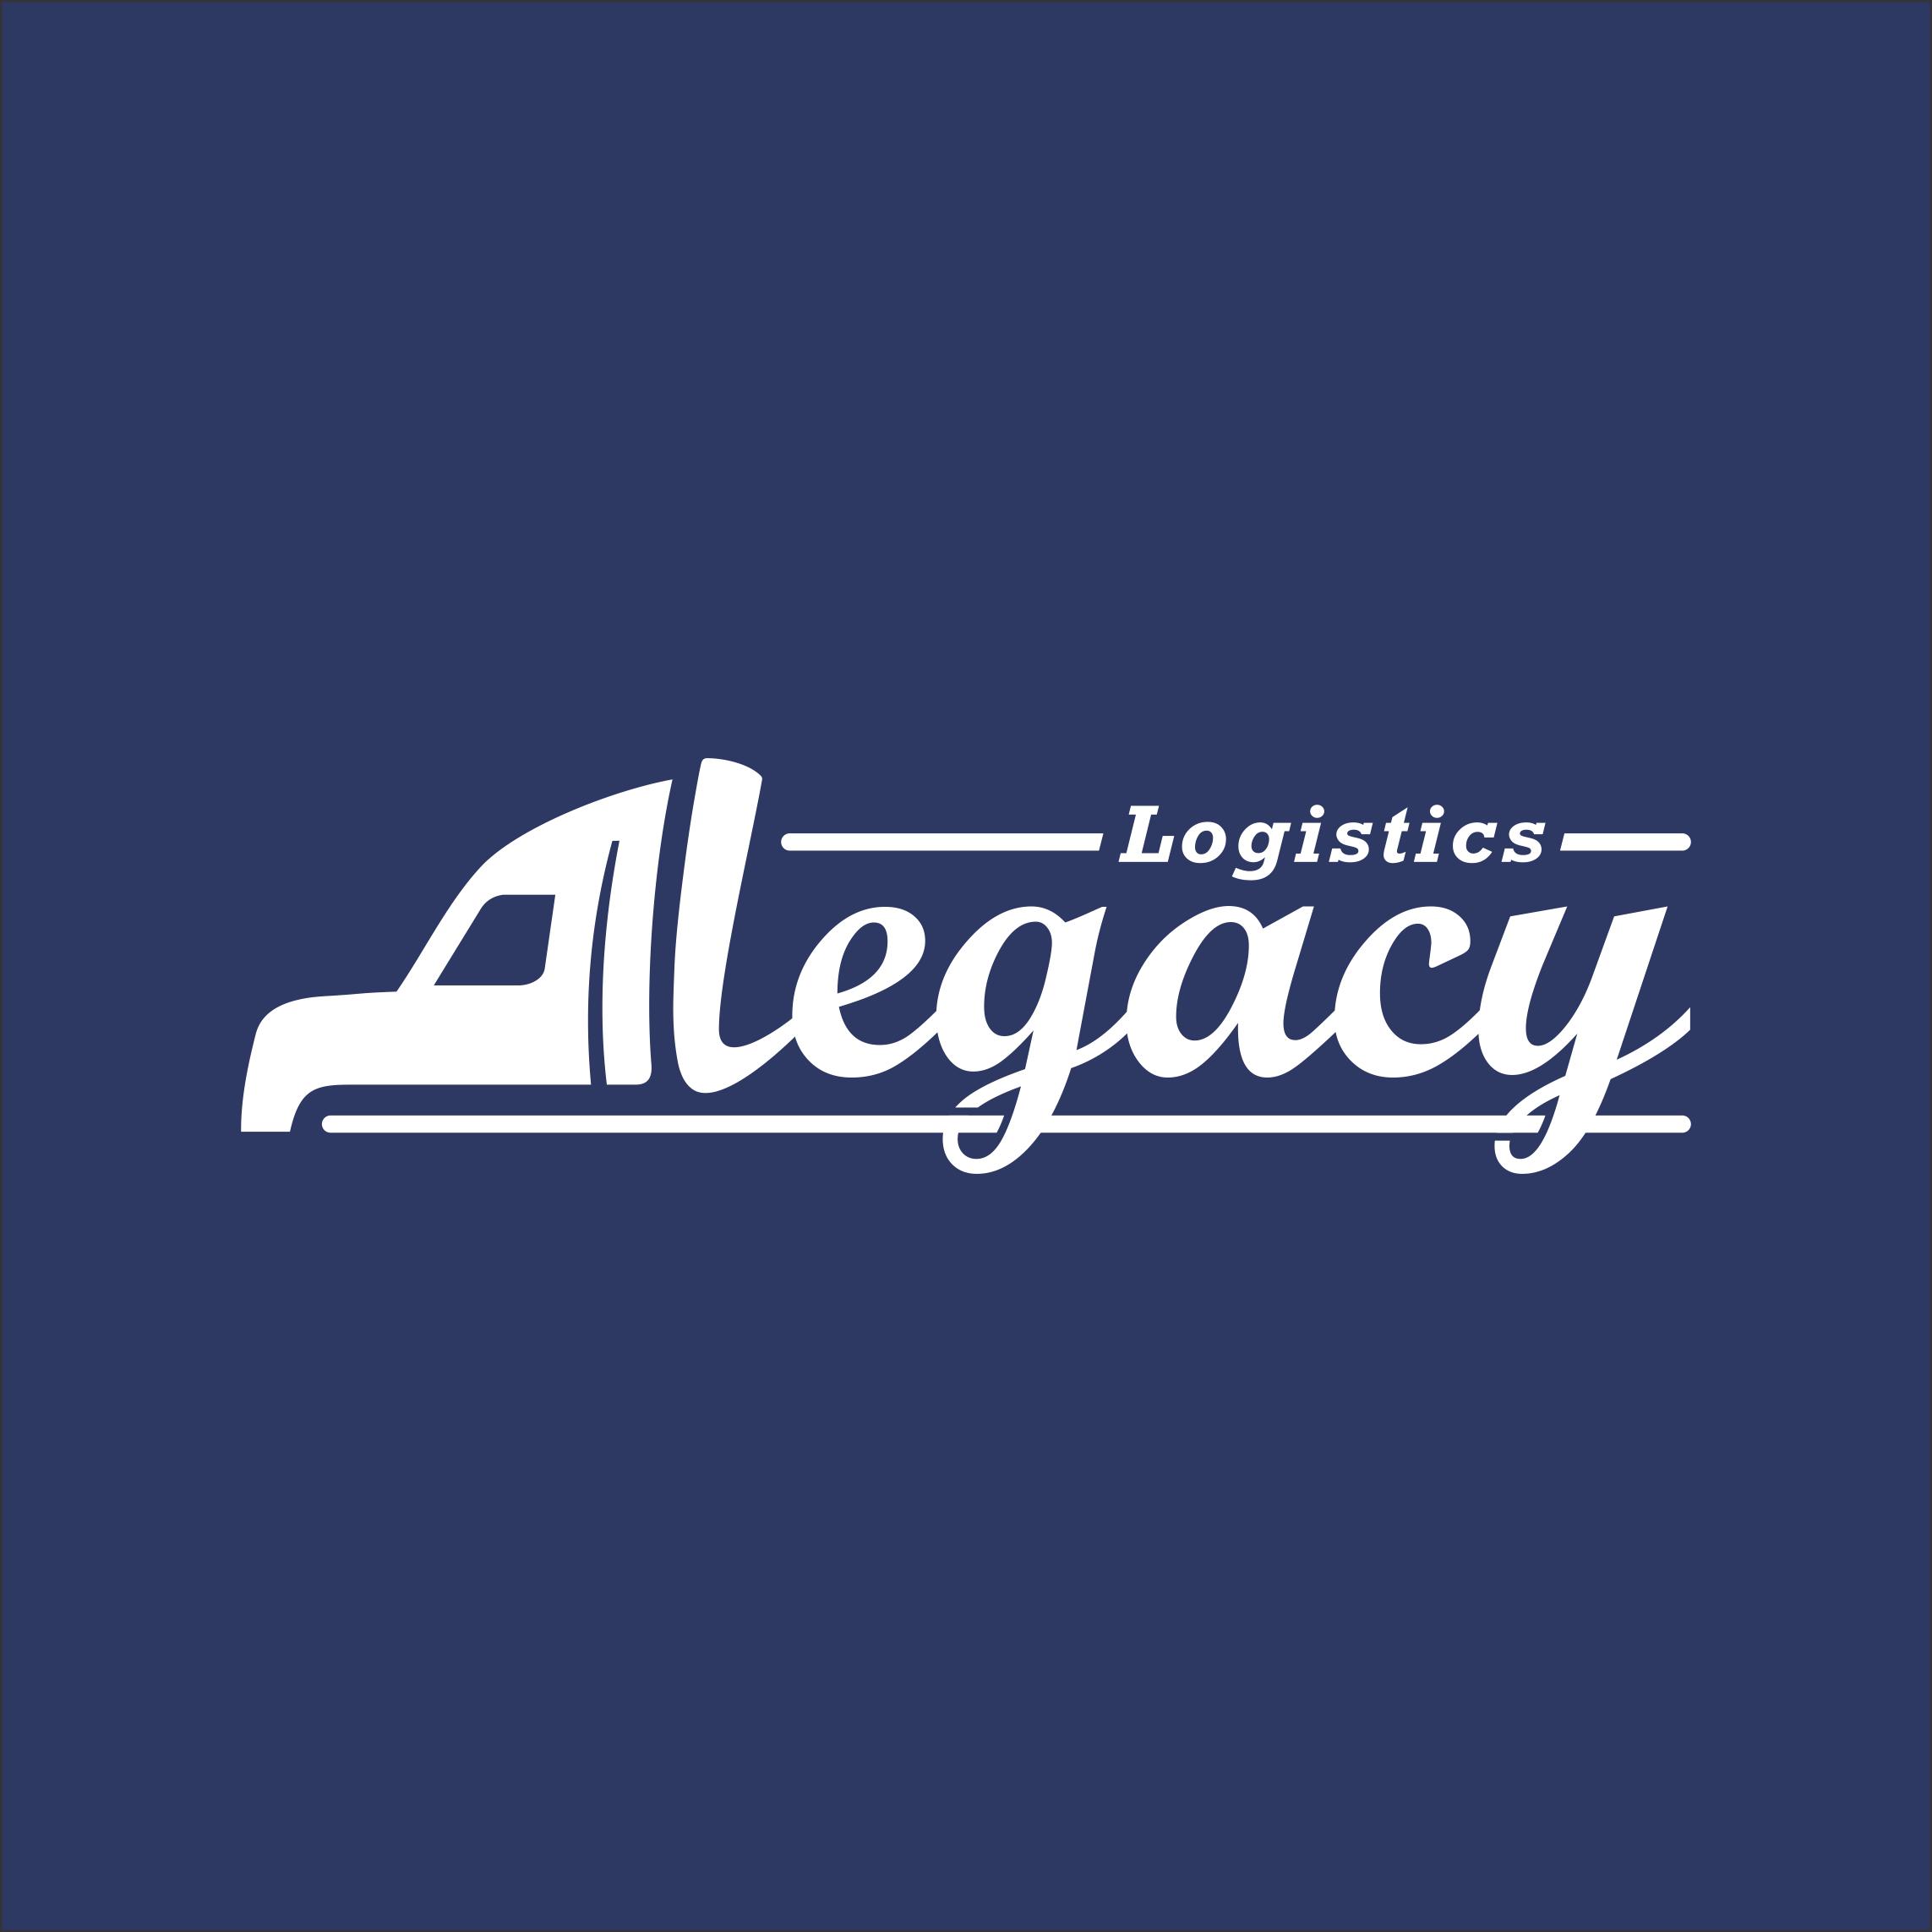 Legacy Logistics Group image 4